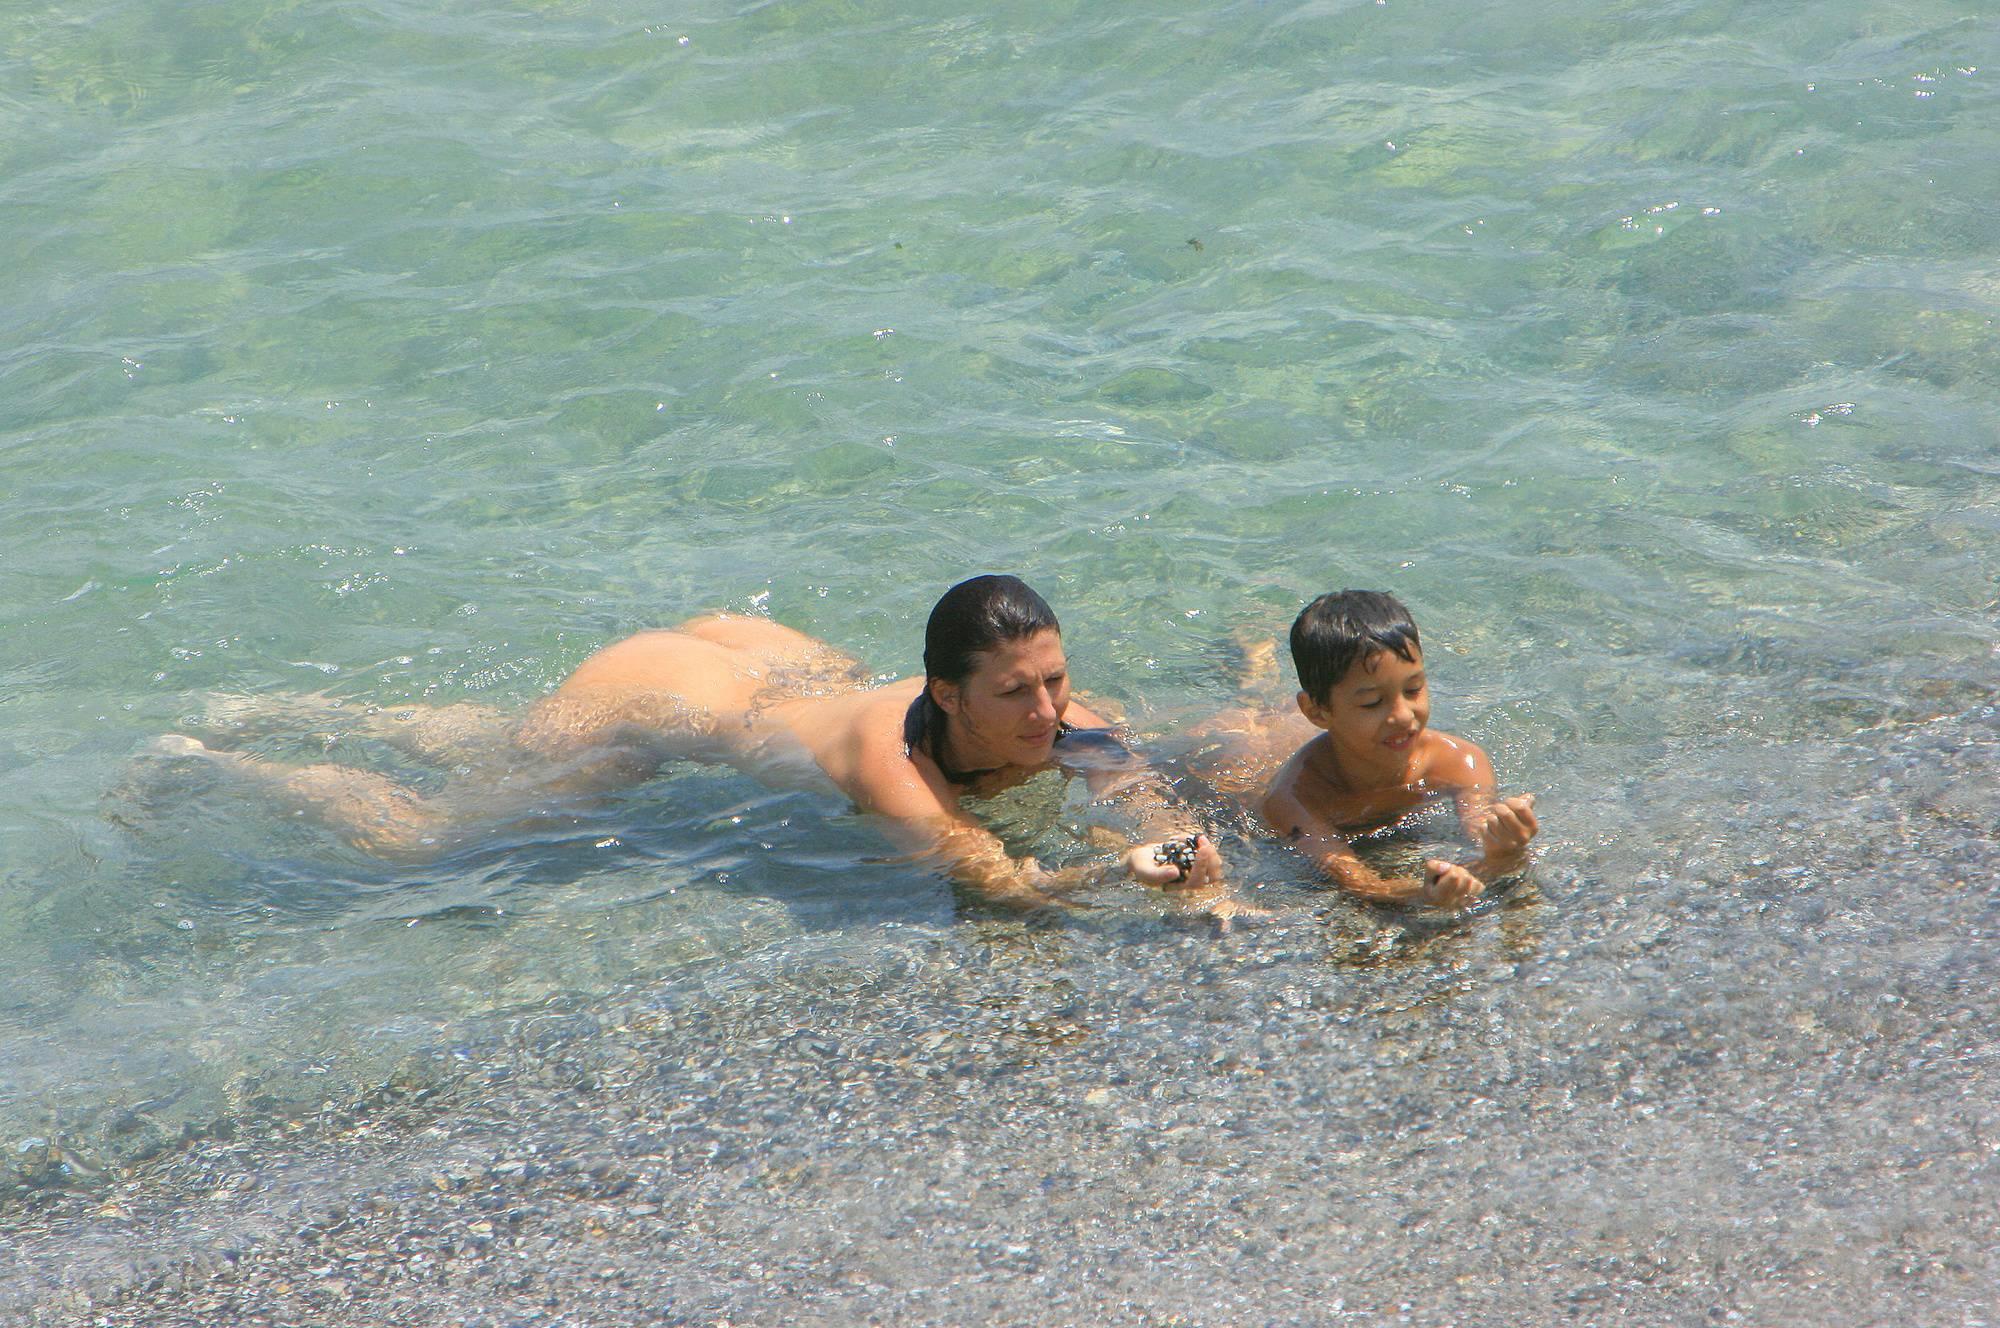 Nudist Pics Bulgarian Family of Three - 1